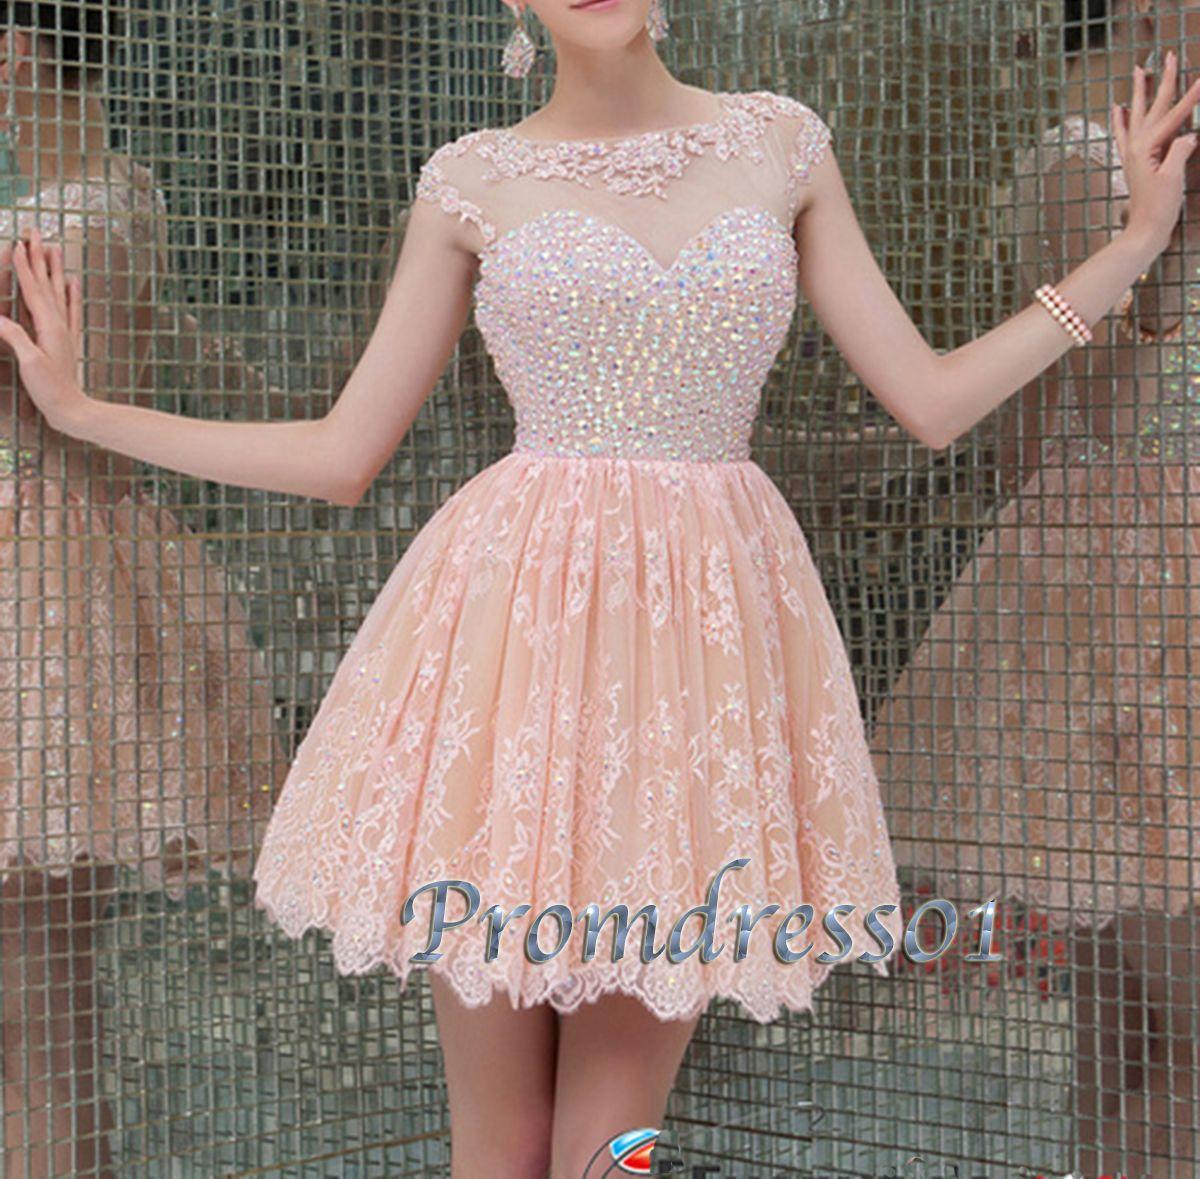 Pin de Danielle Chalecki en ♛ Prom Dresses ♛ | Pinterest ...